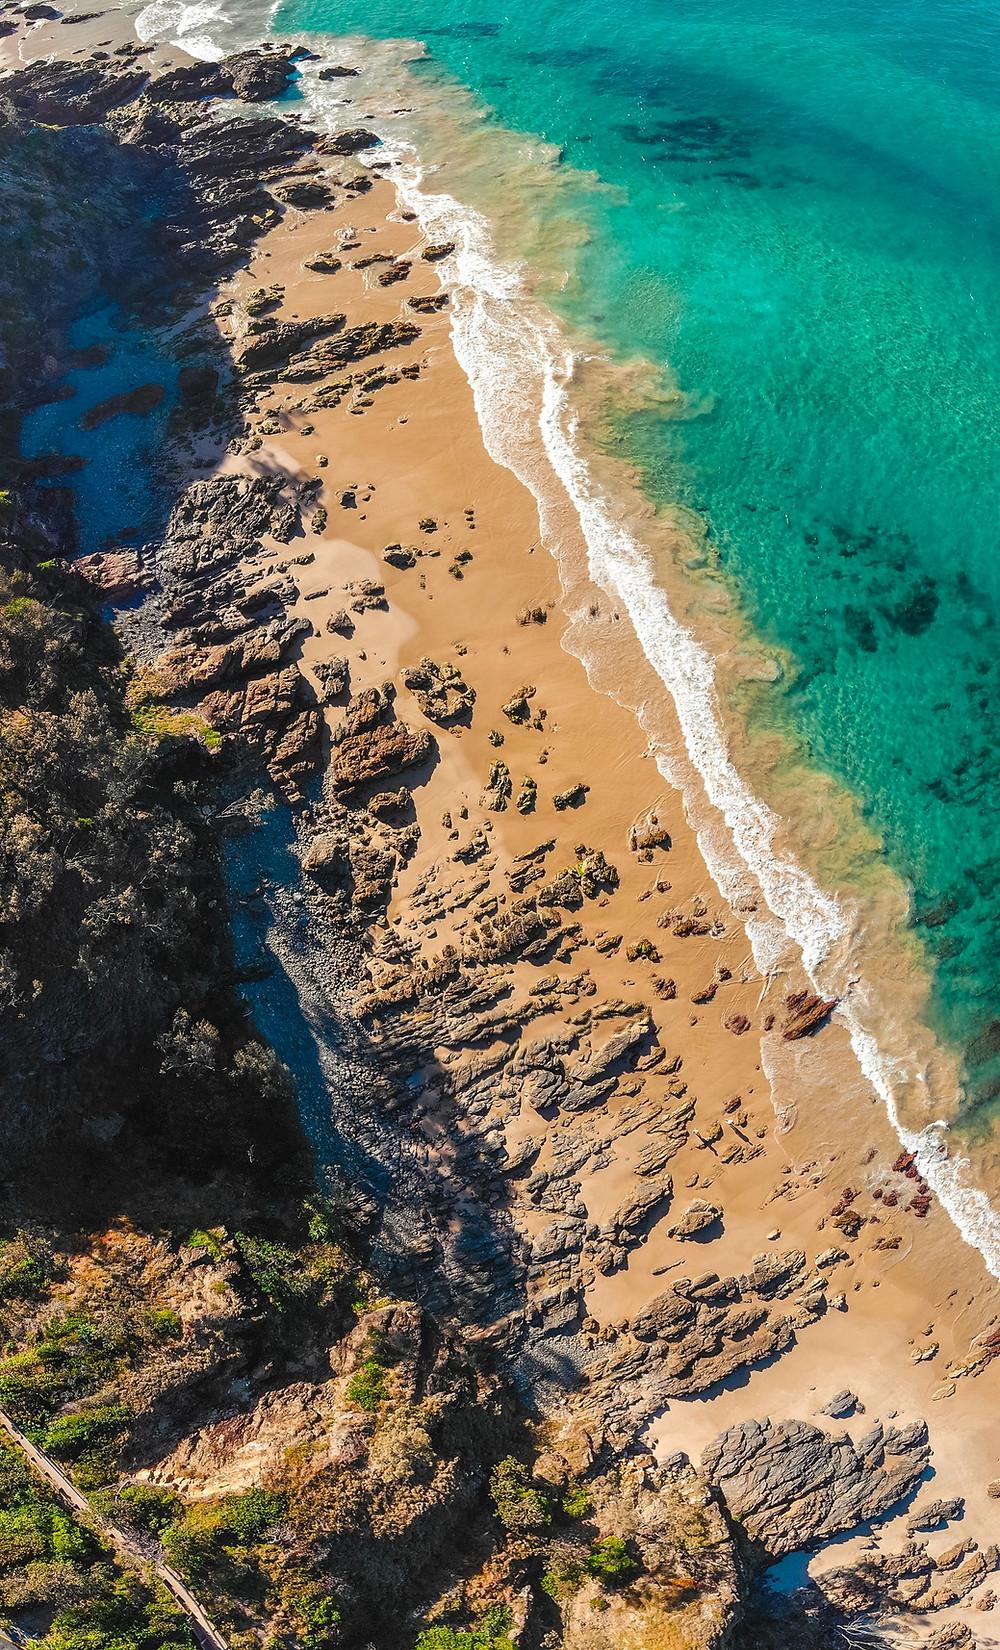 Rocks and sand oceanside